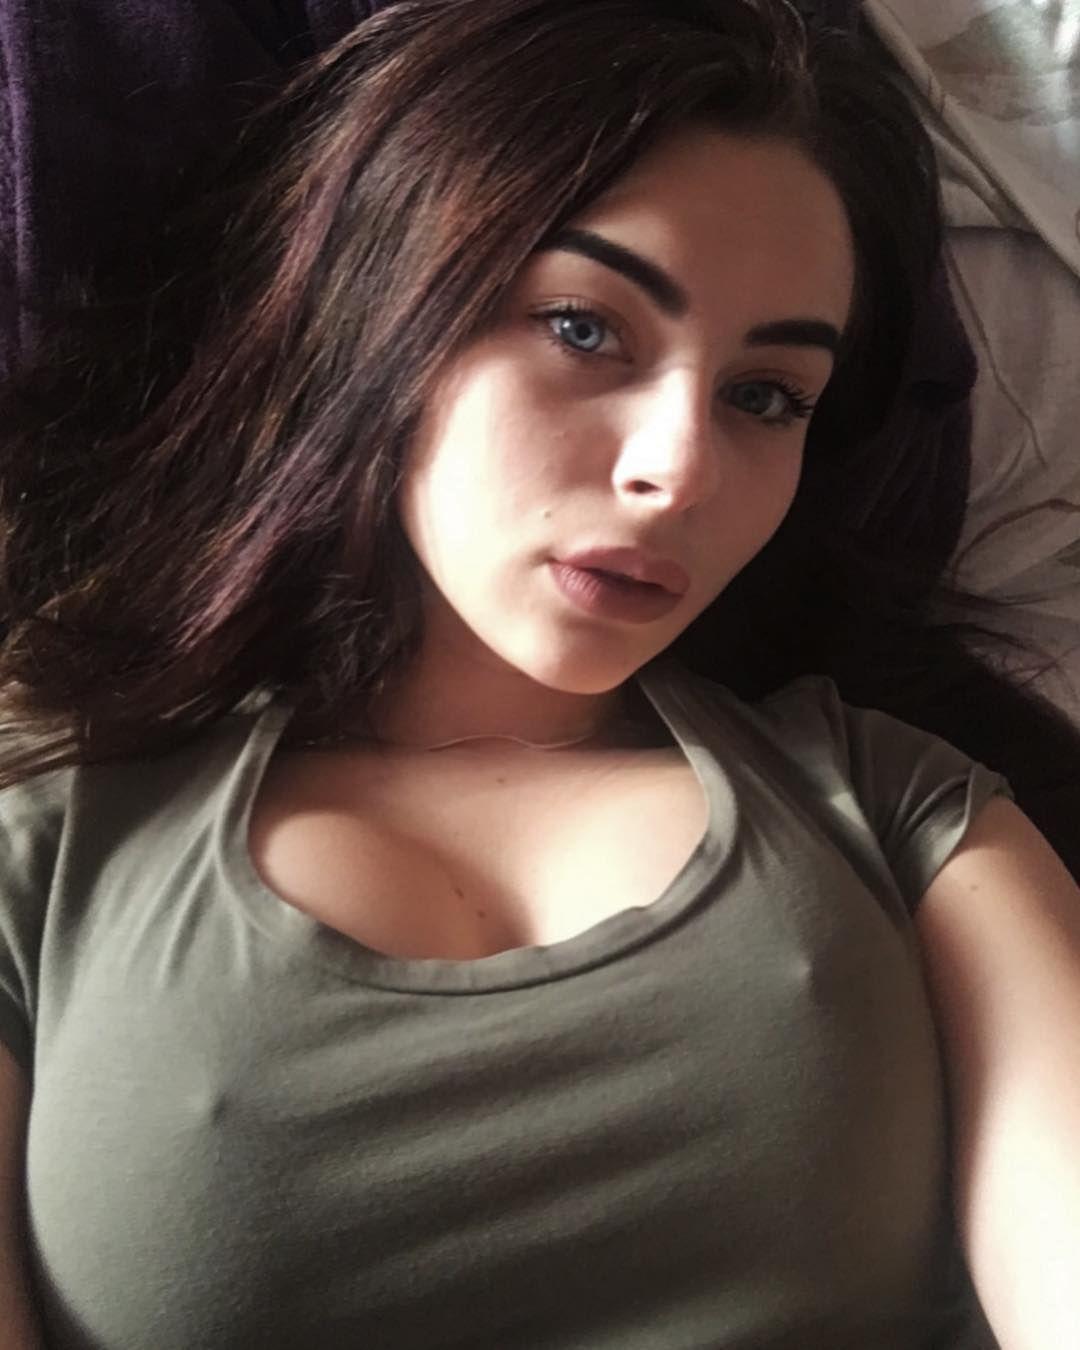 Mikhalina Novakovskaya Nude & Sexy (61 Photos) 48